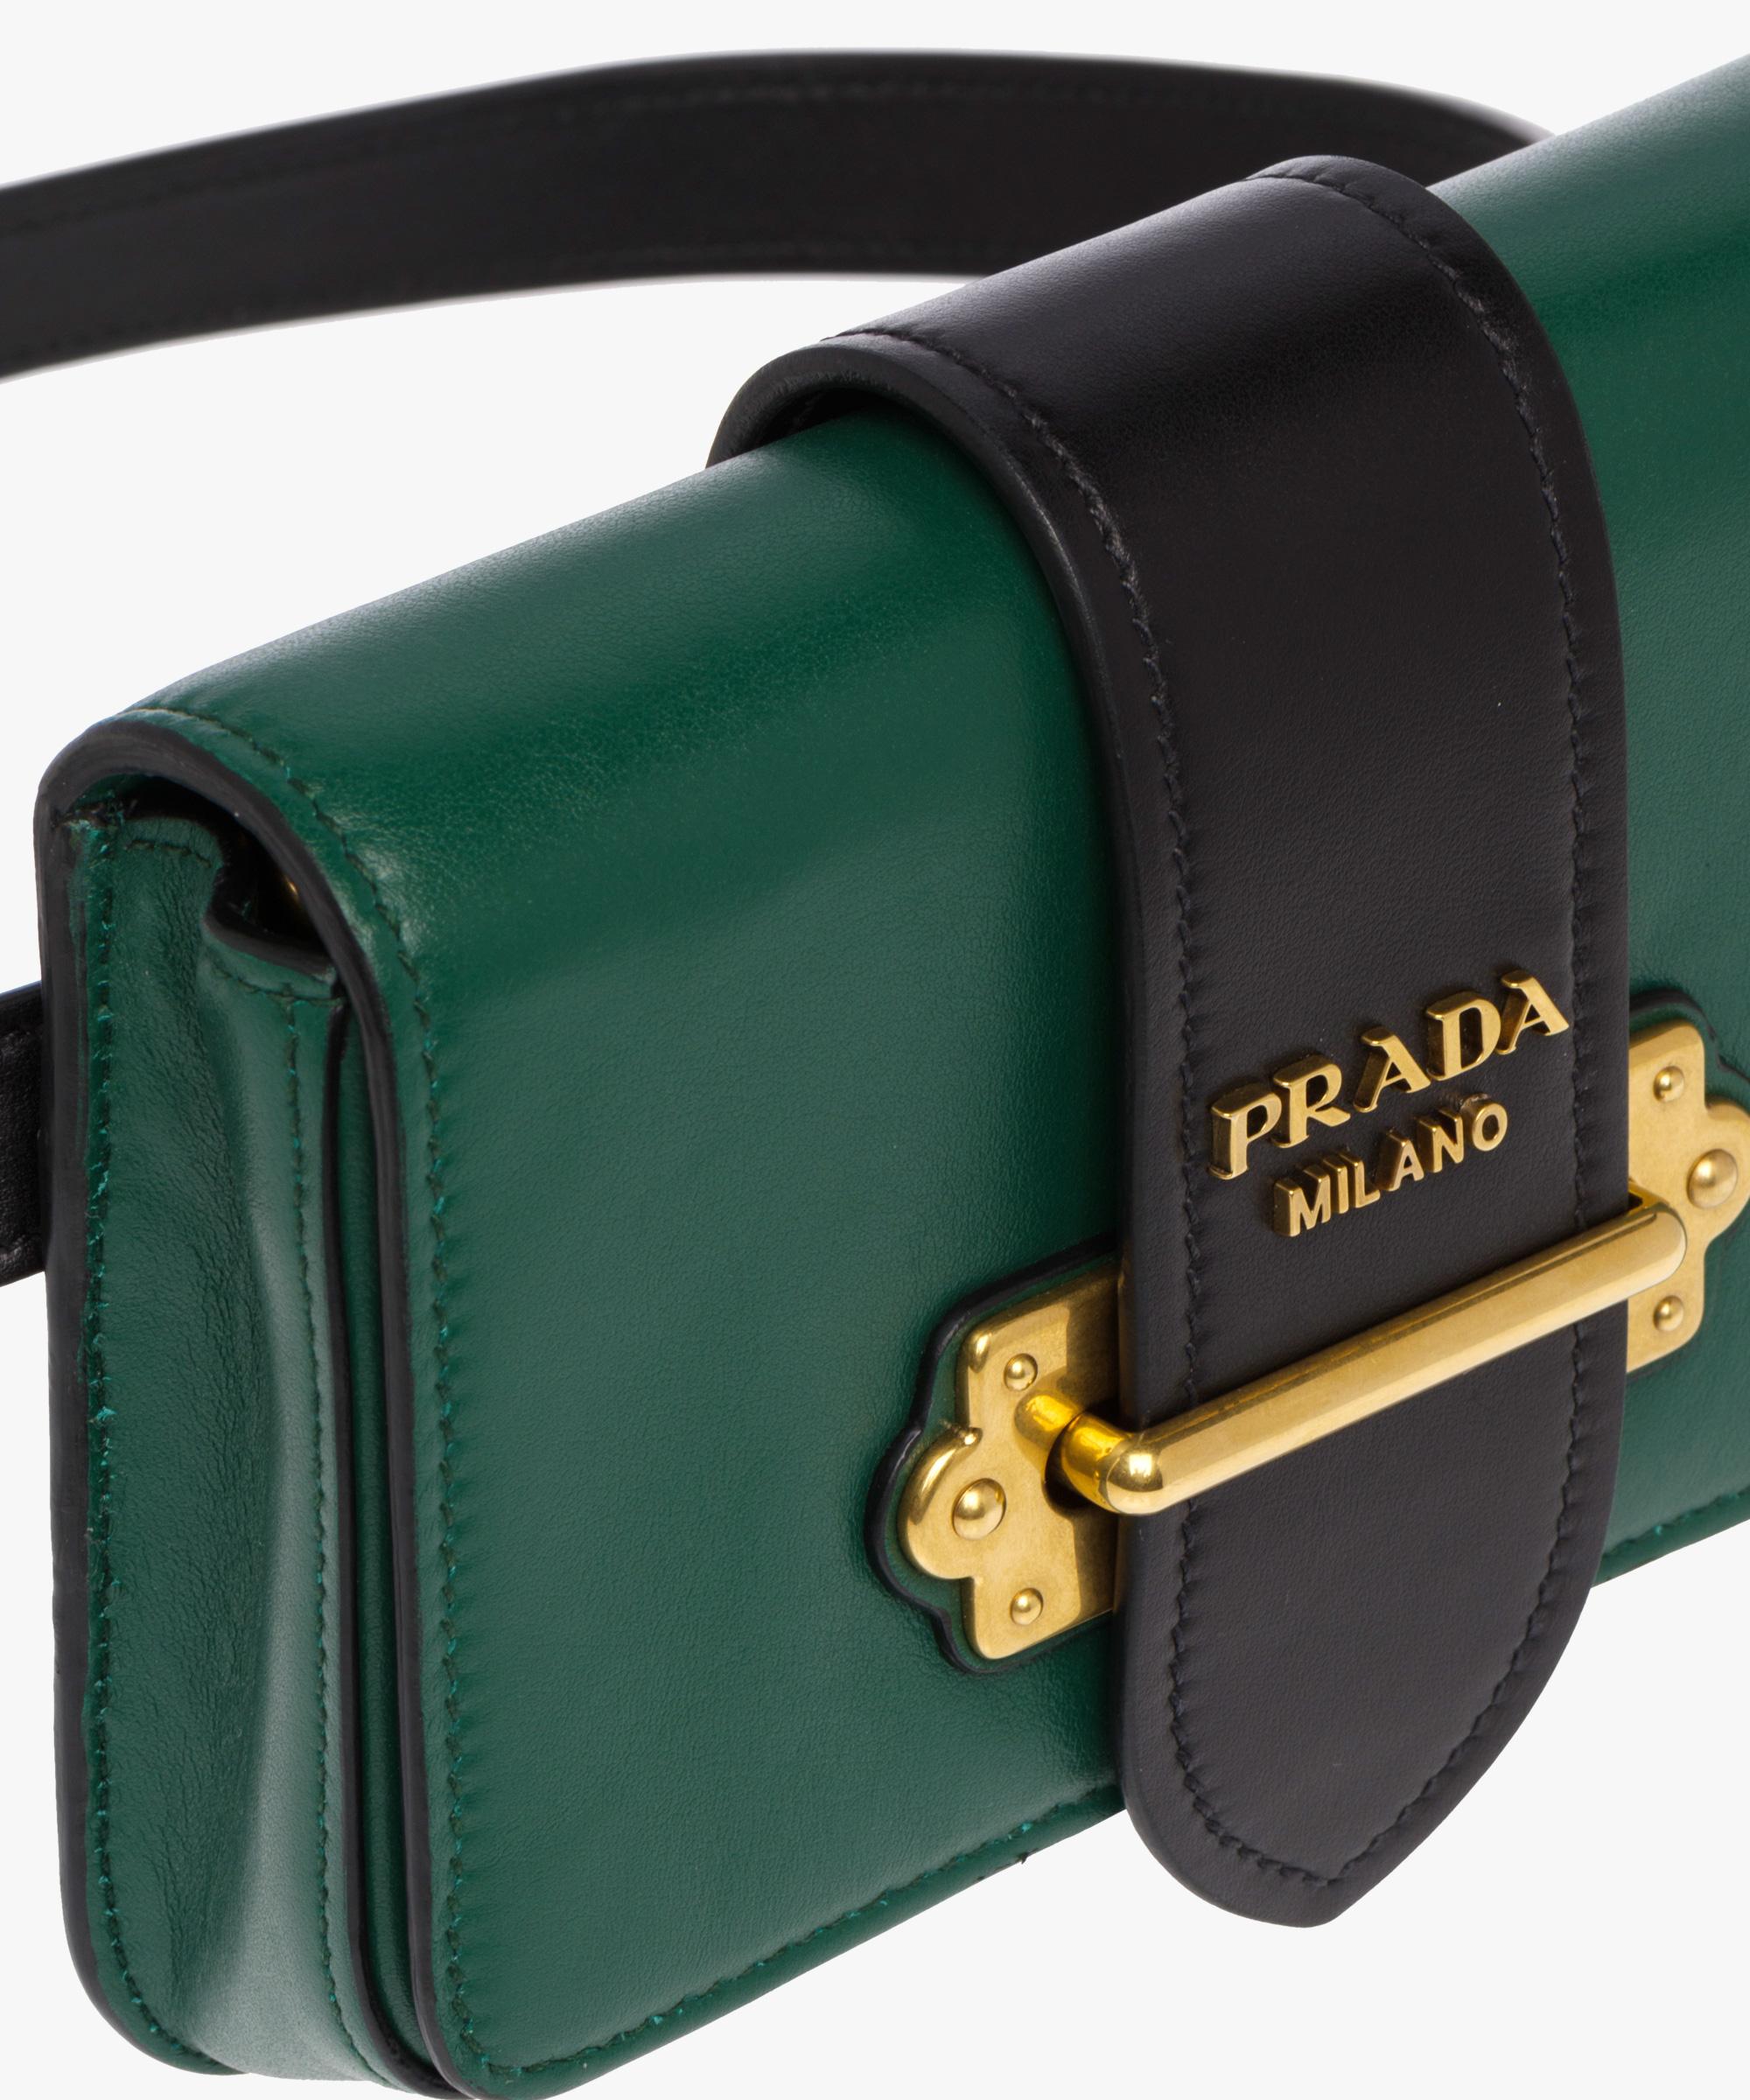 e09339aa548ae ... Prada Cahier Belt Bag Prada BILLIARD GREEN BLACK ...